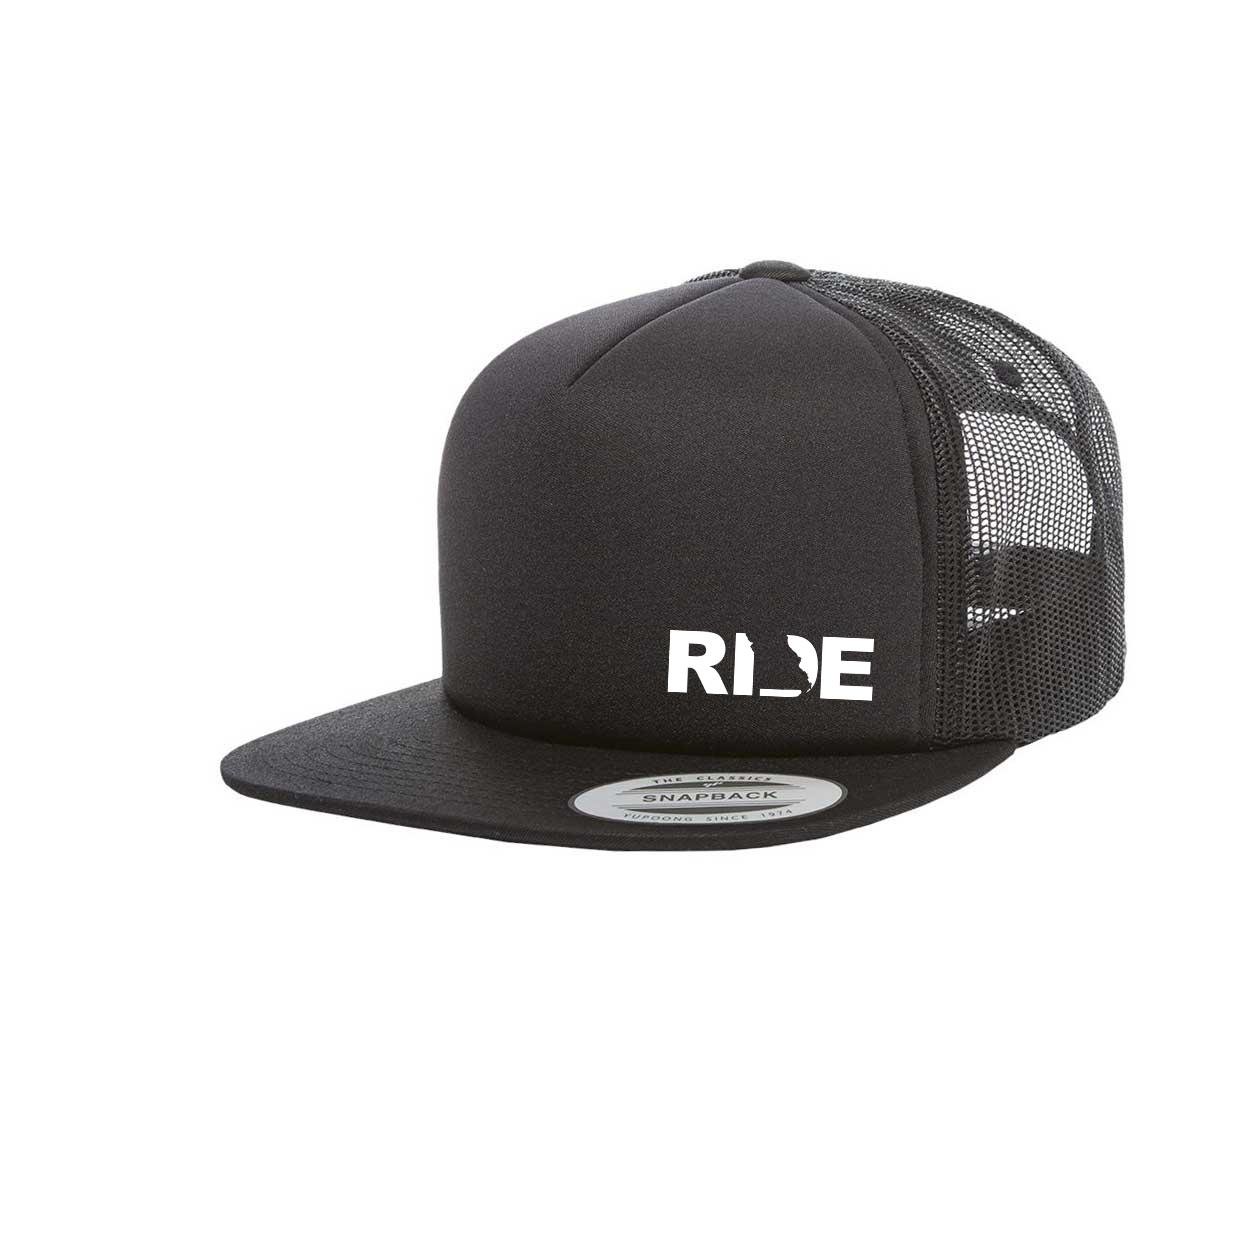 Ride Missouri Night Out Premium Foam Flat Brim Snapback Hat Black (White Logo)